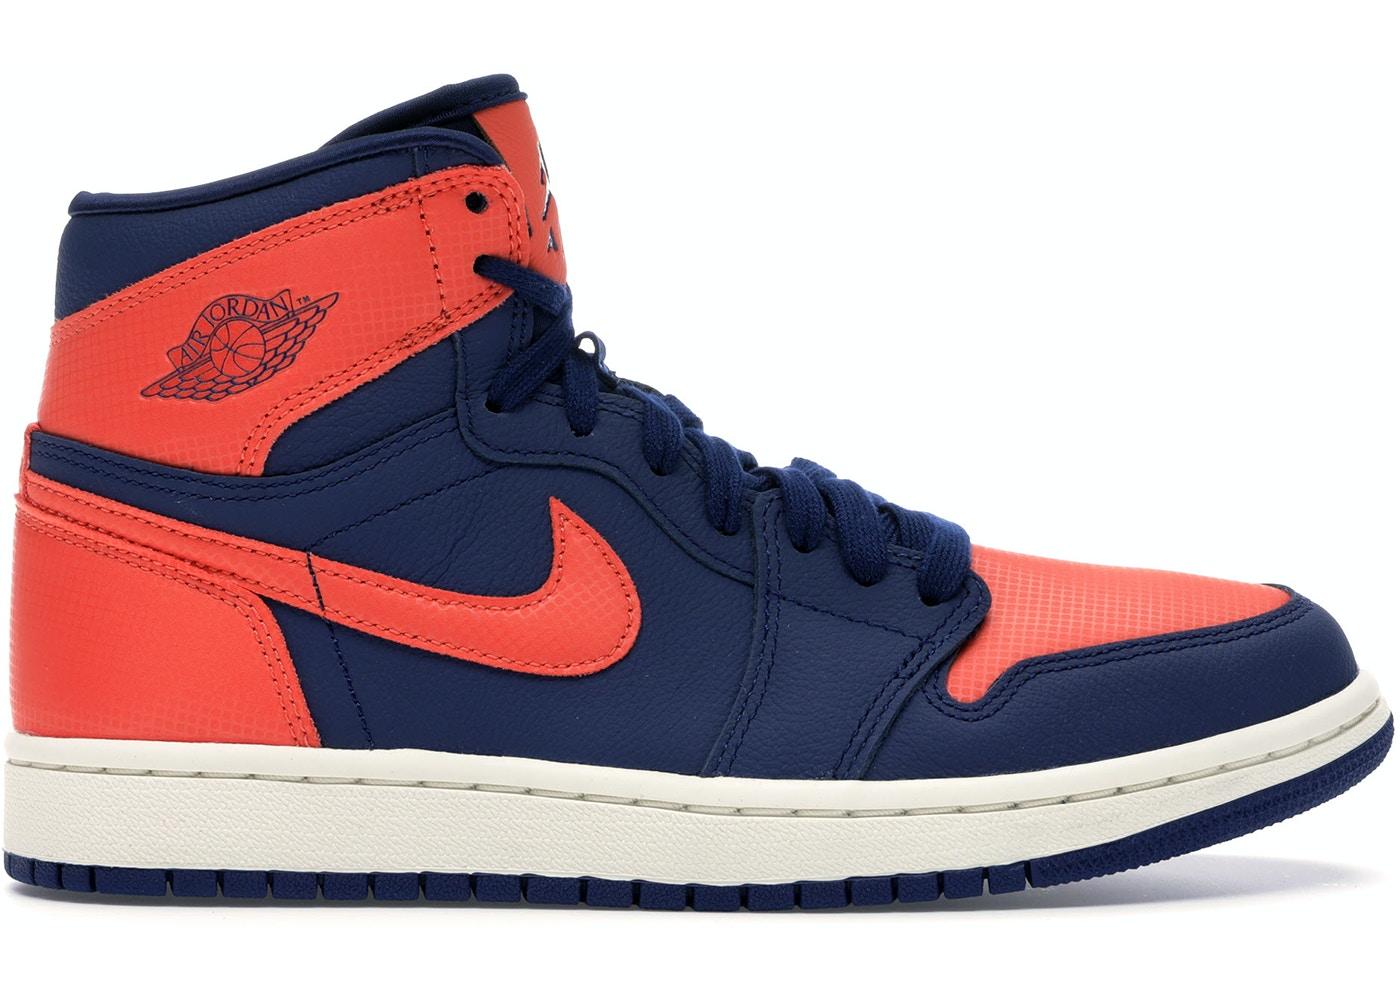 Jordan 1 Retro High Blue Void Turf Orange W Ah7389 408